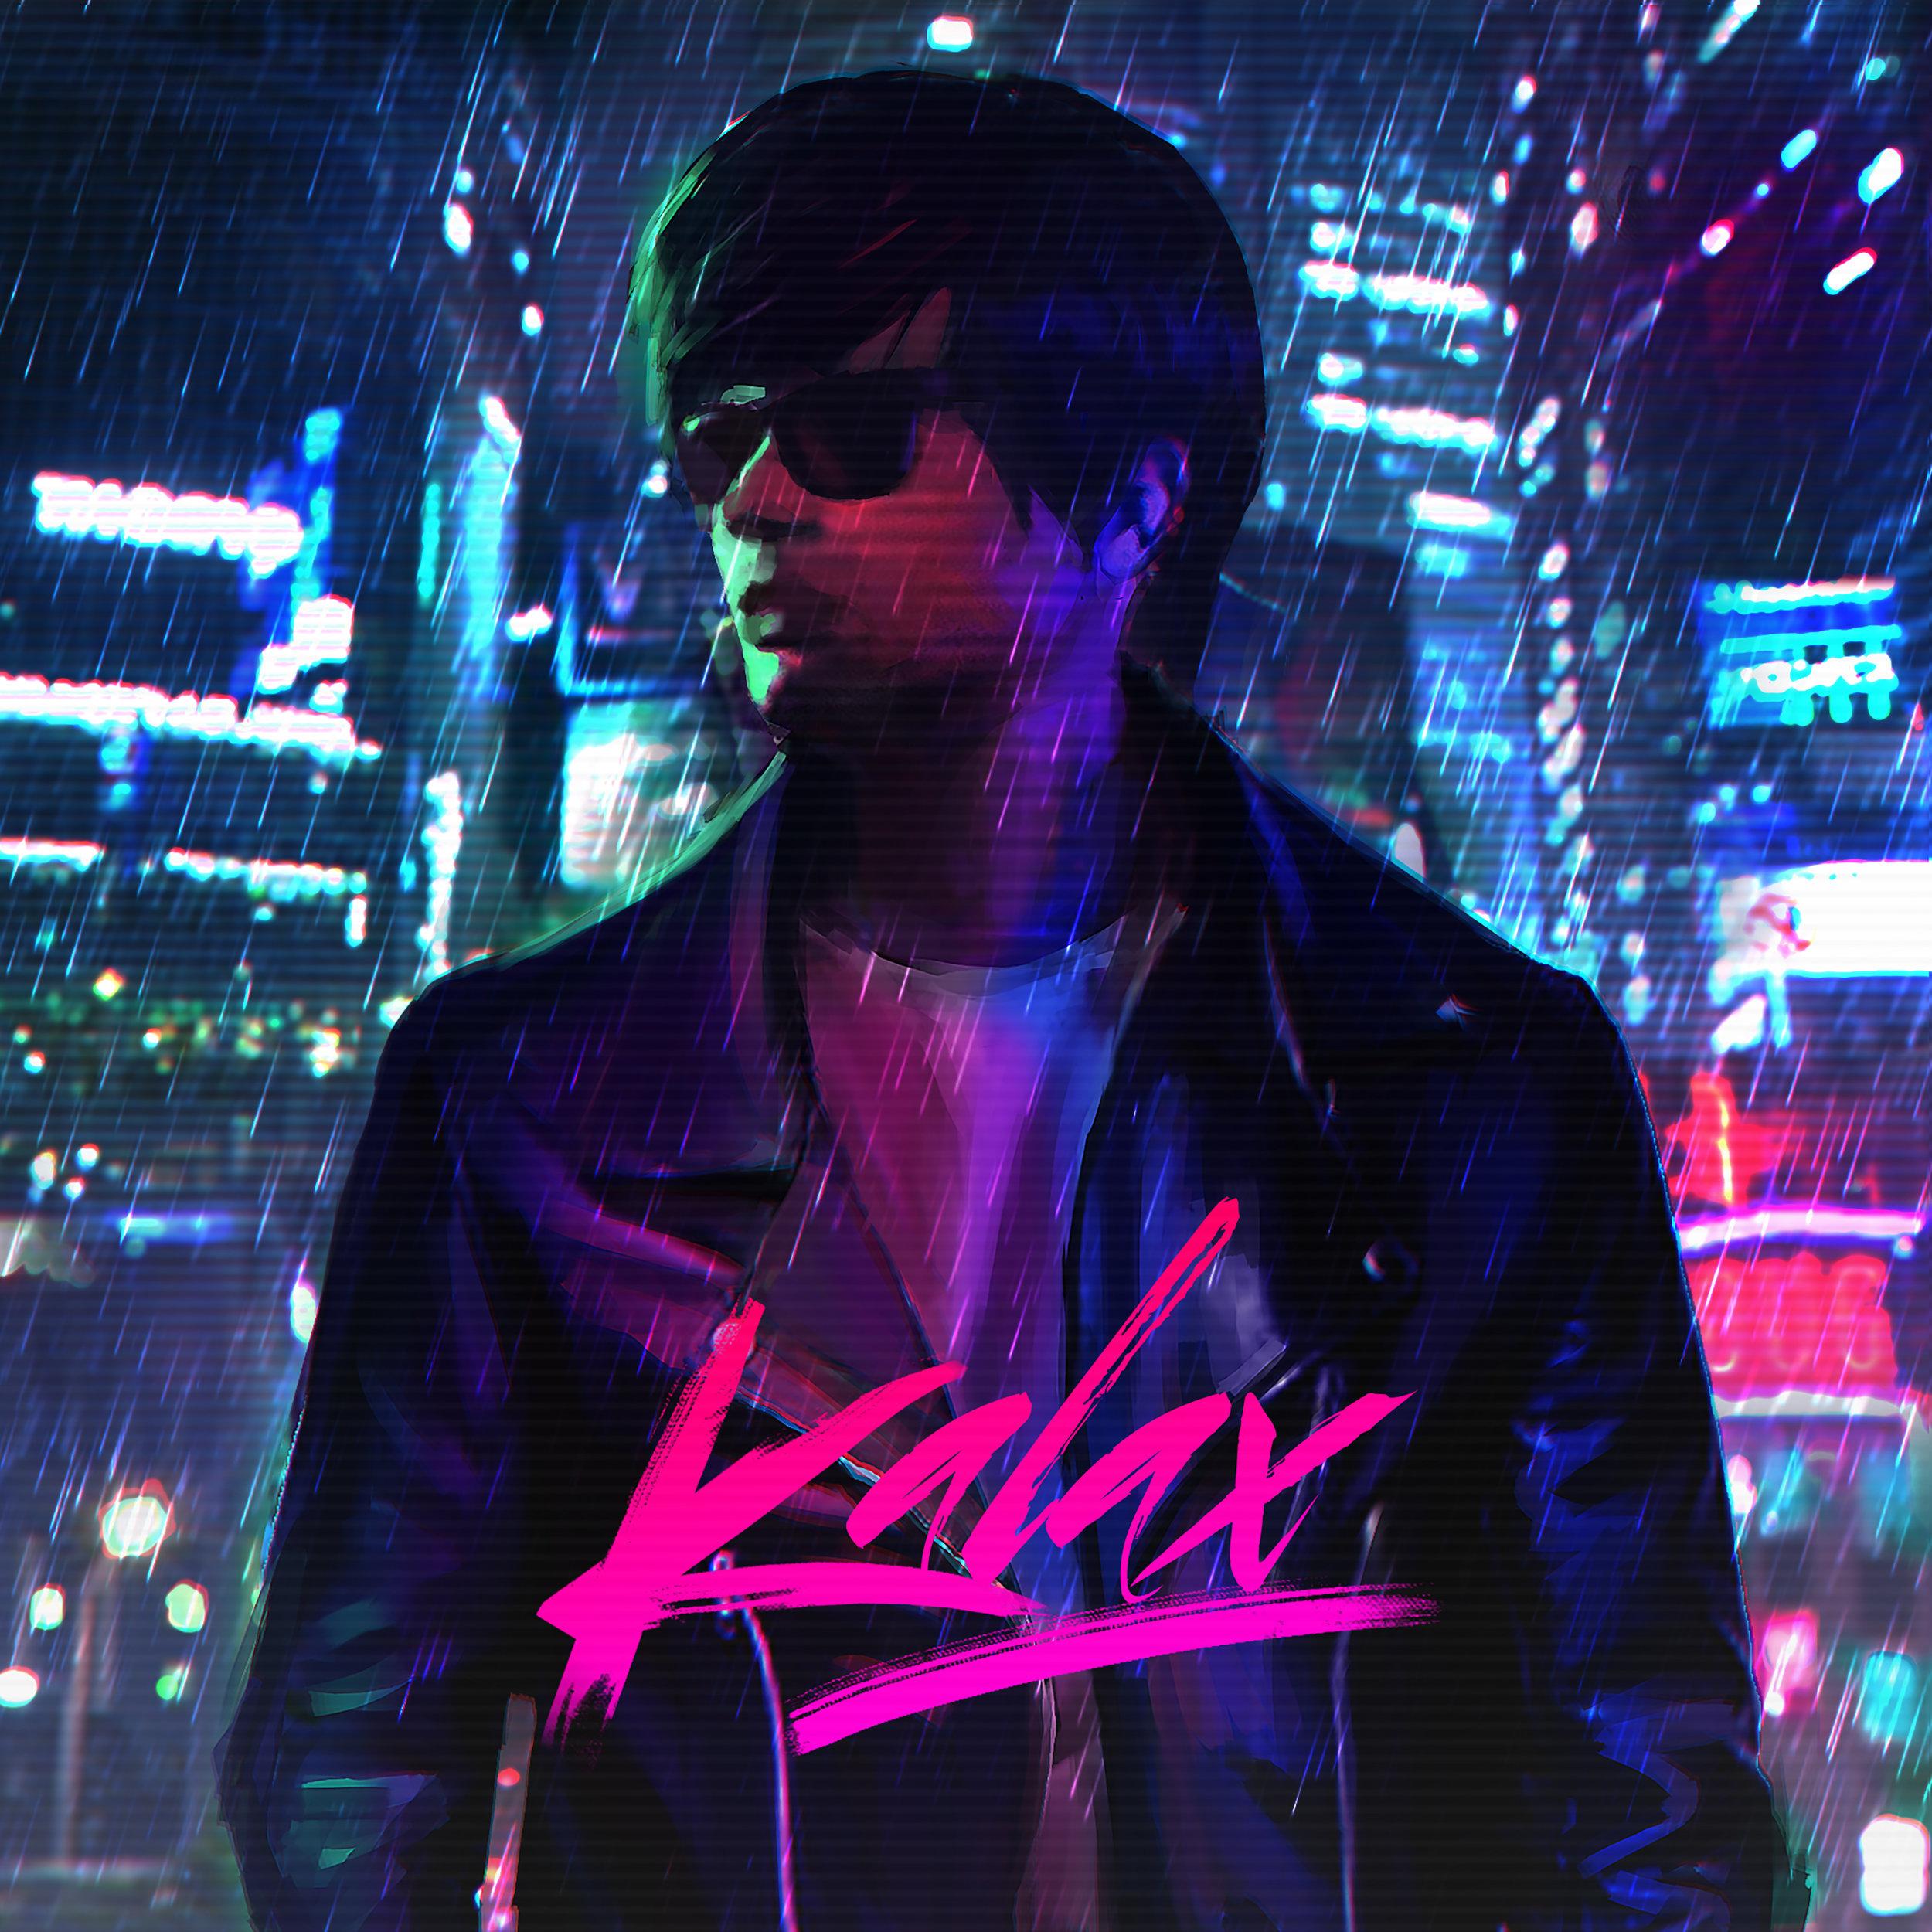 Kalax - Kalax - cover.jpg